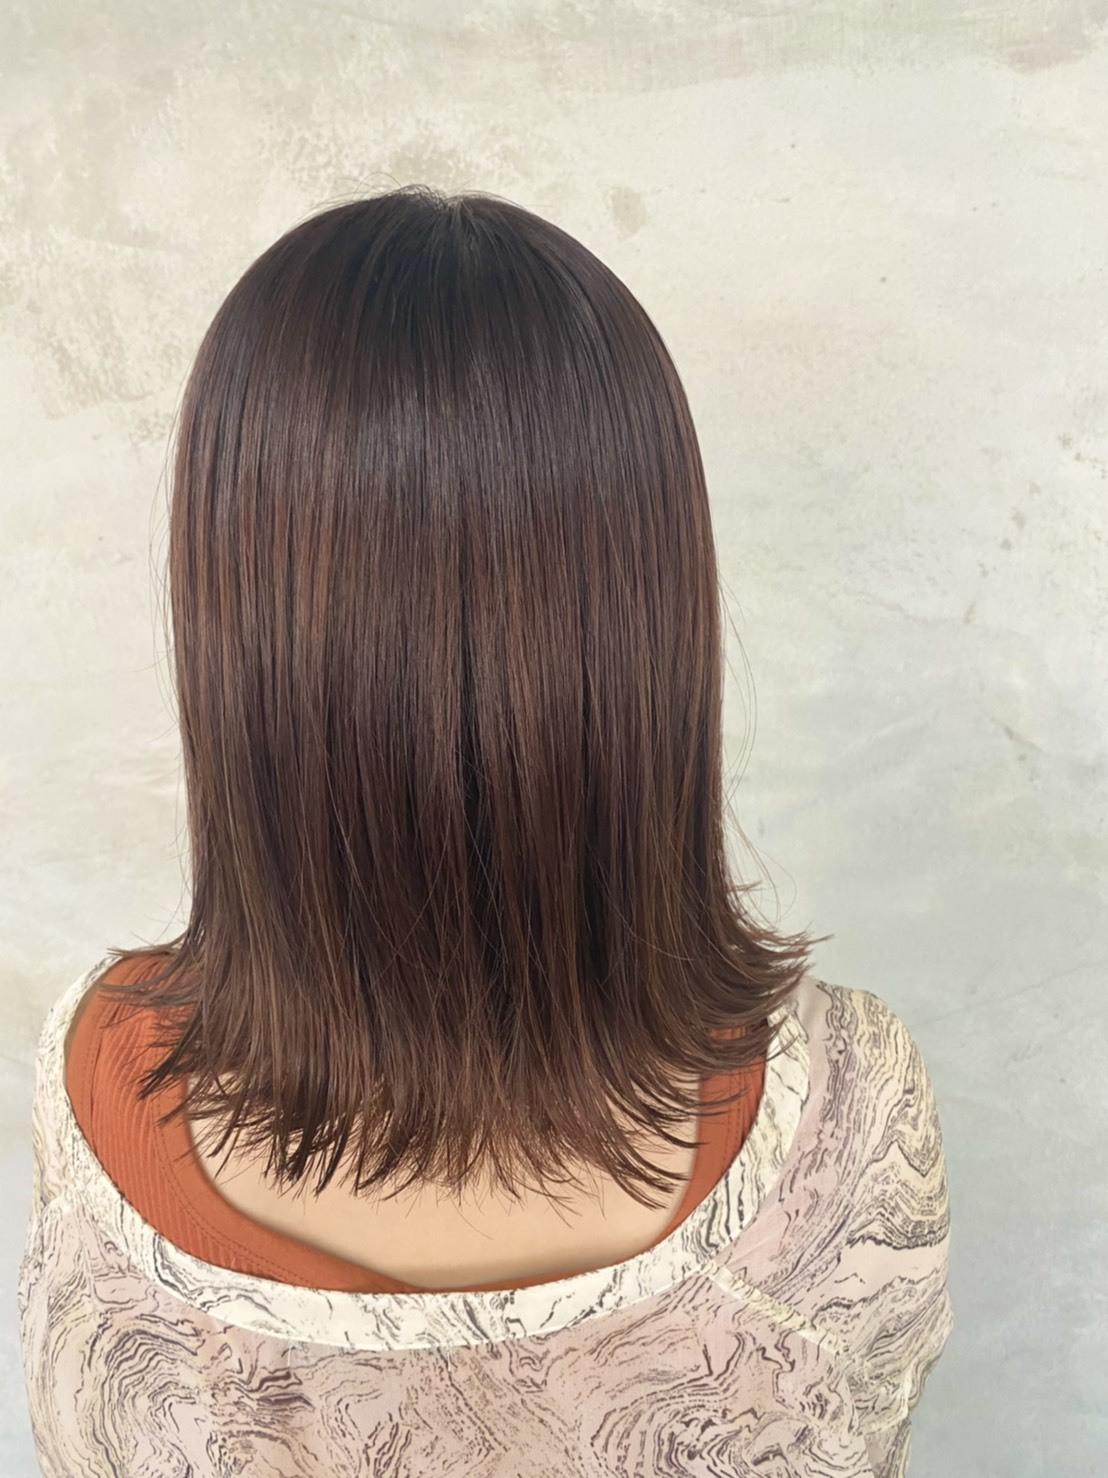 SNSで大人気の「髪質改善」。SET-UPの酸熱トリートメントで挑戦を☆